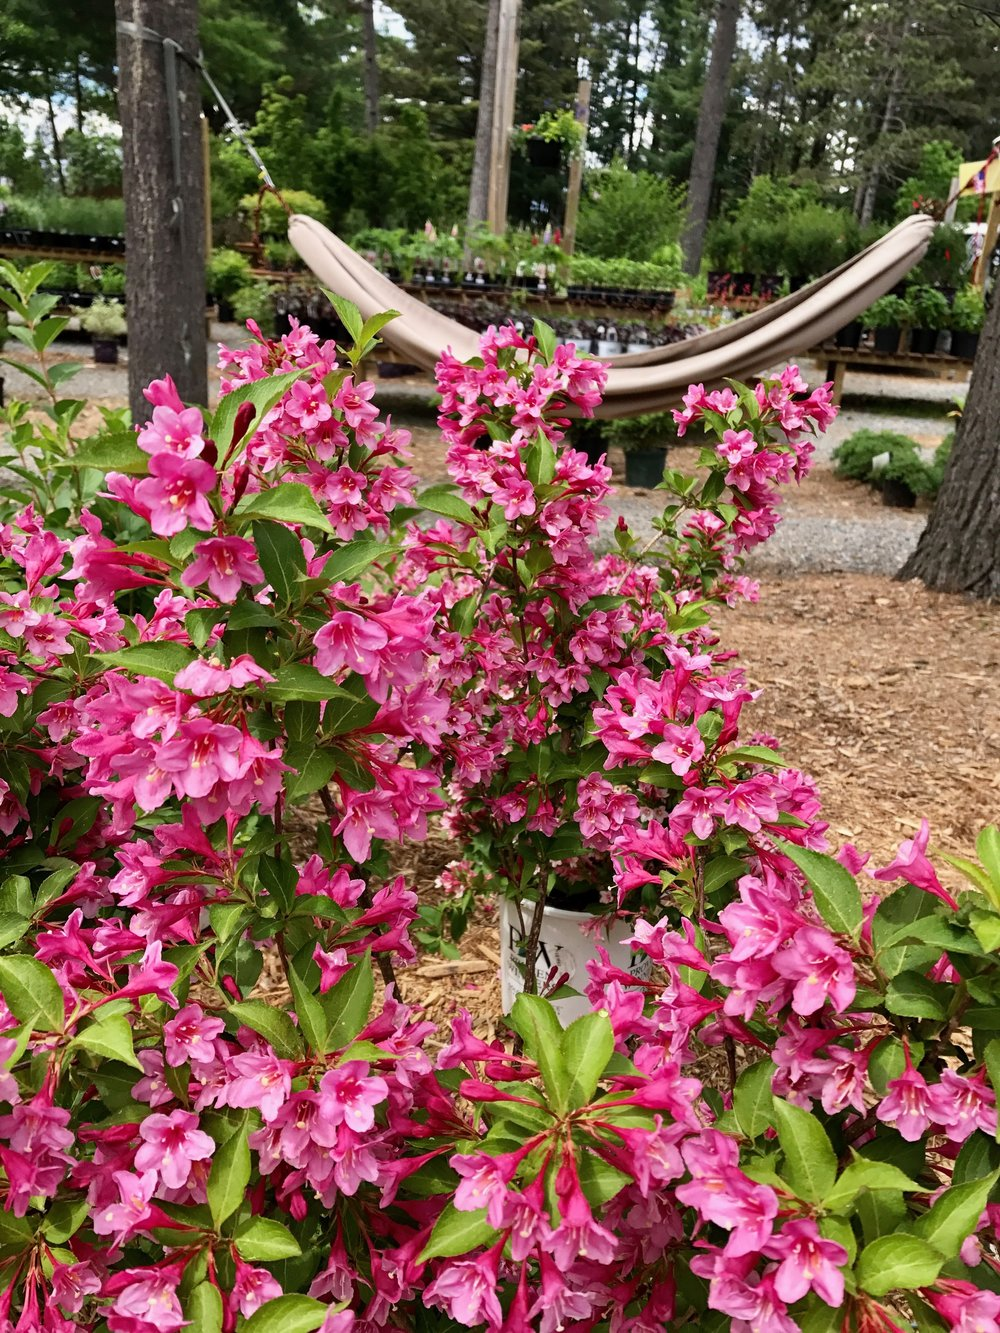 Weigelia flowering shrub